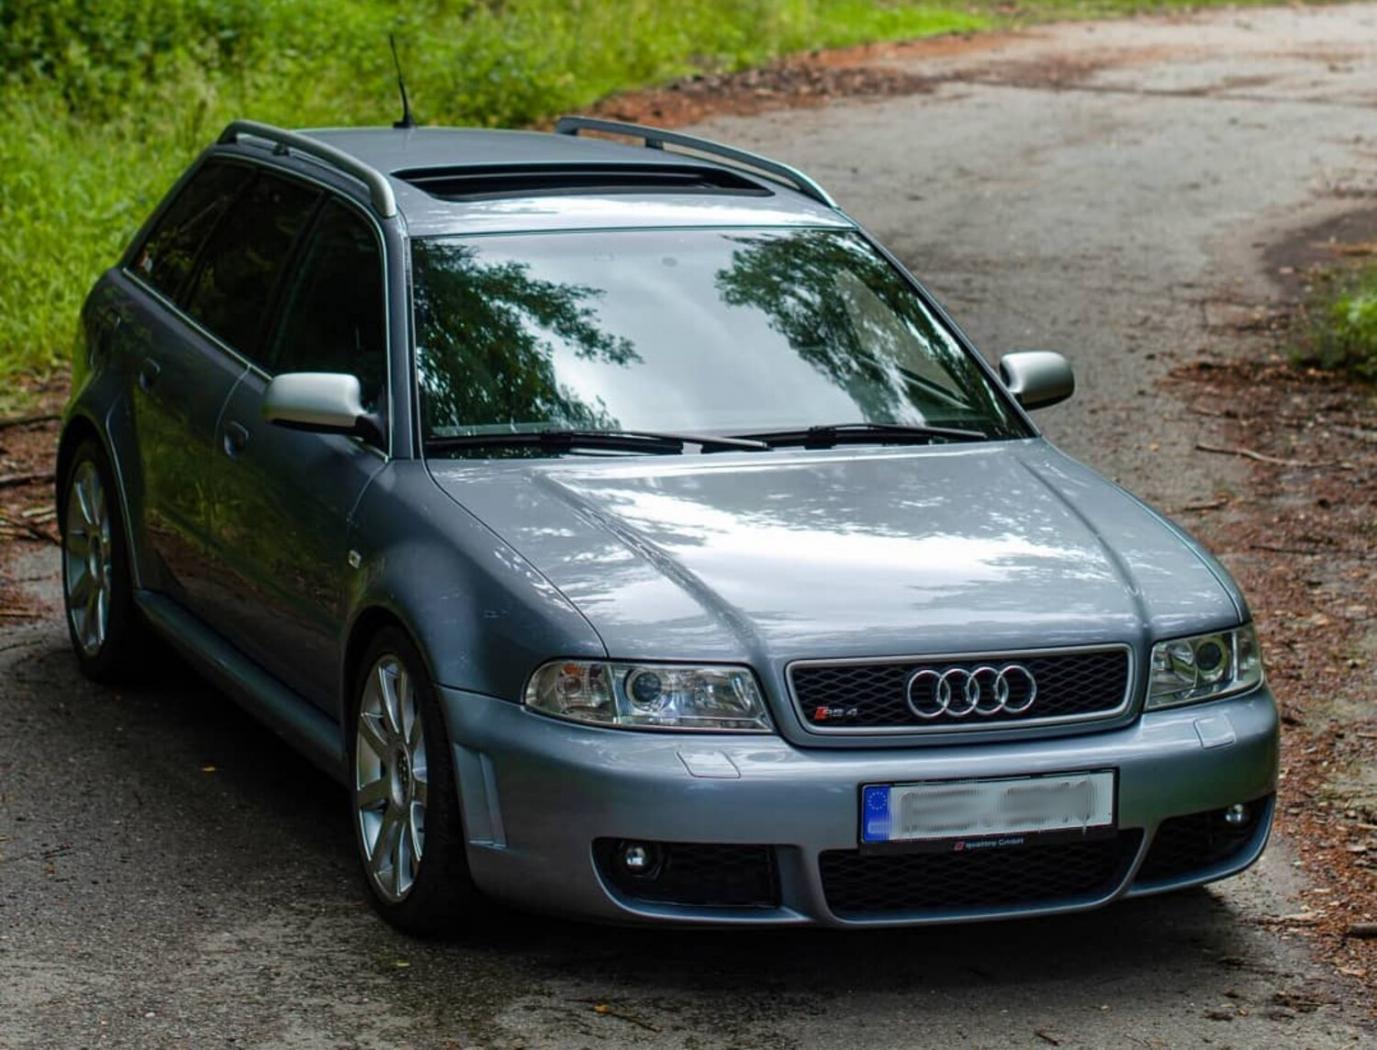 Audi-RS4-B5-Fiche-occasion-1.jpeg